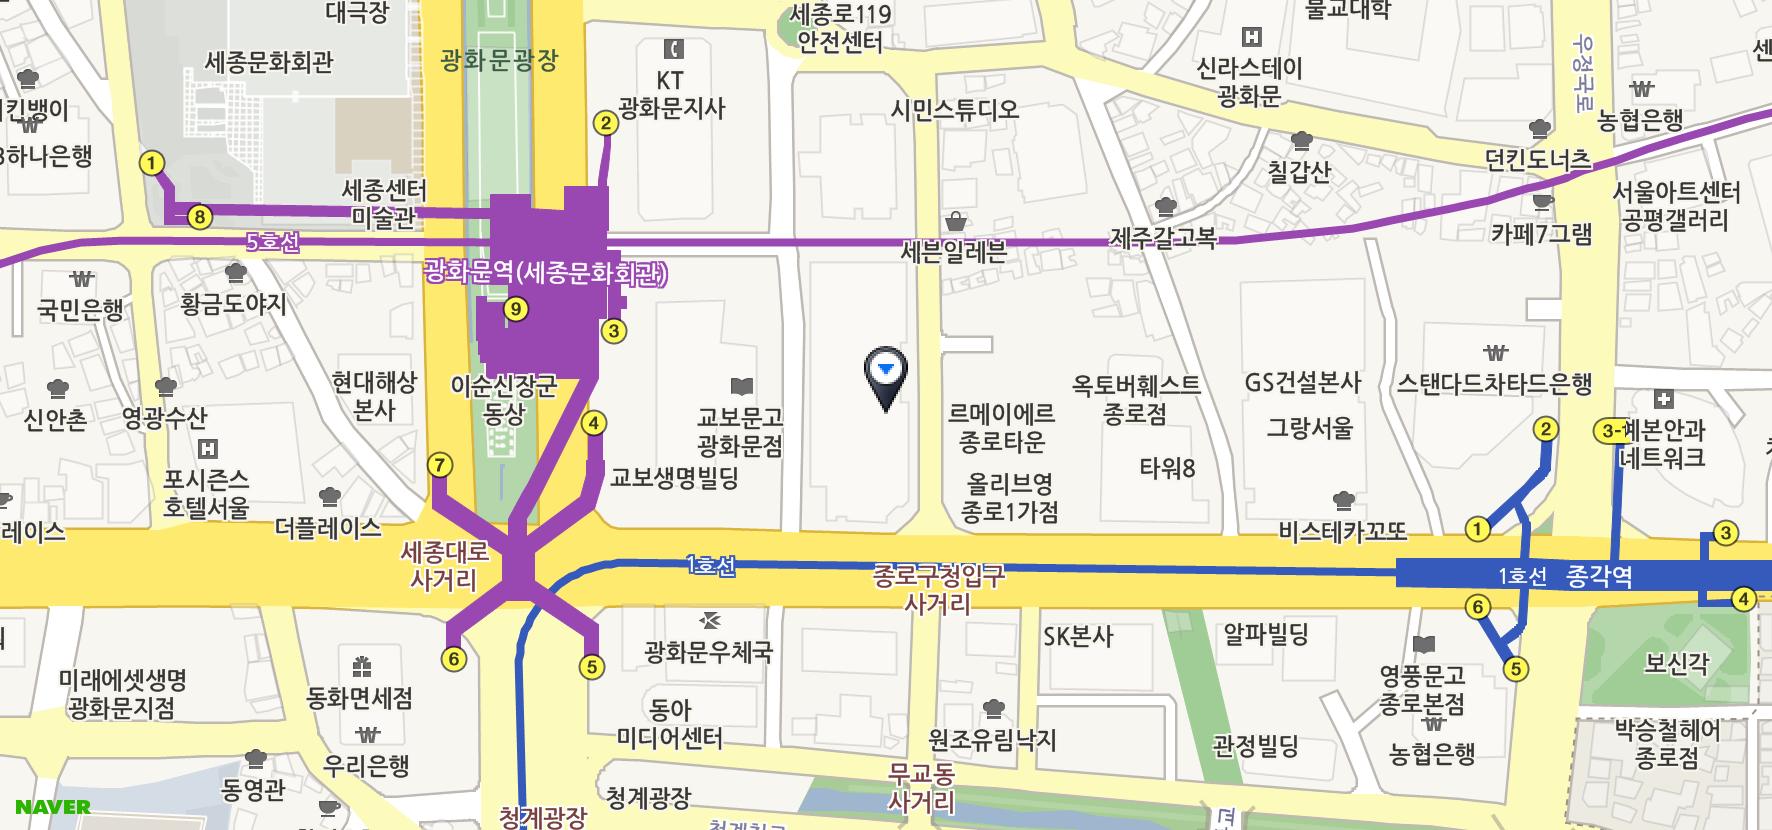 Hummus Kitchen Halal Restaurant Travel Tips for Seoul Korea